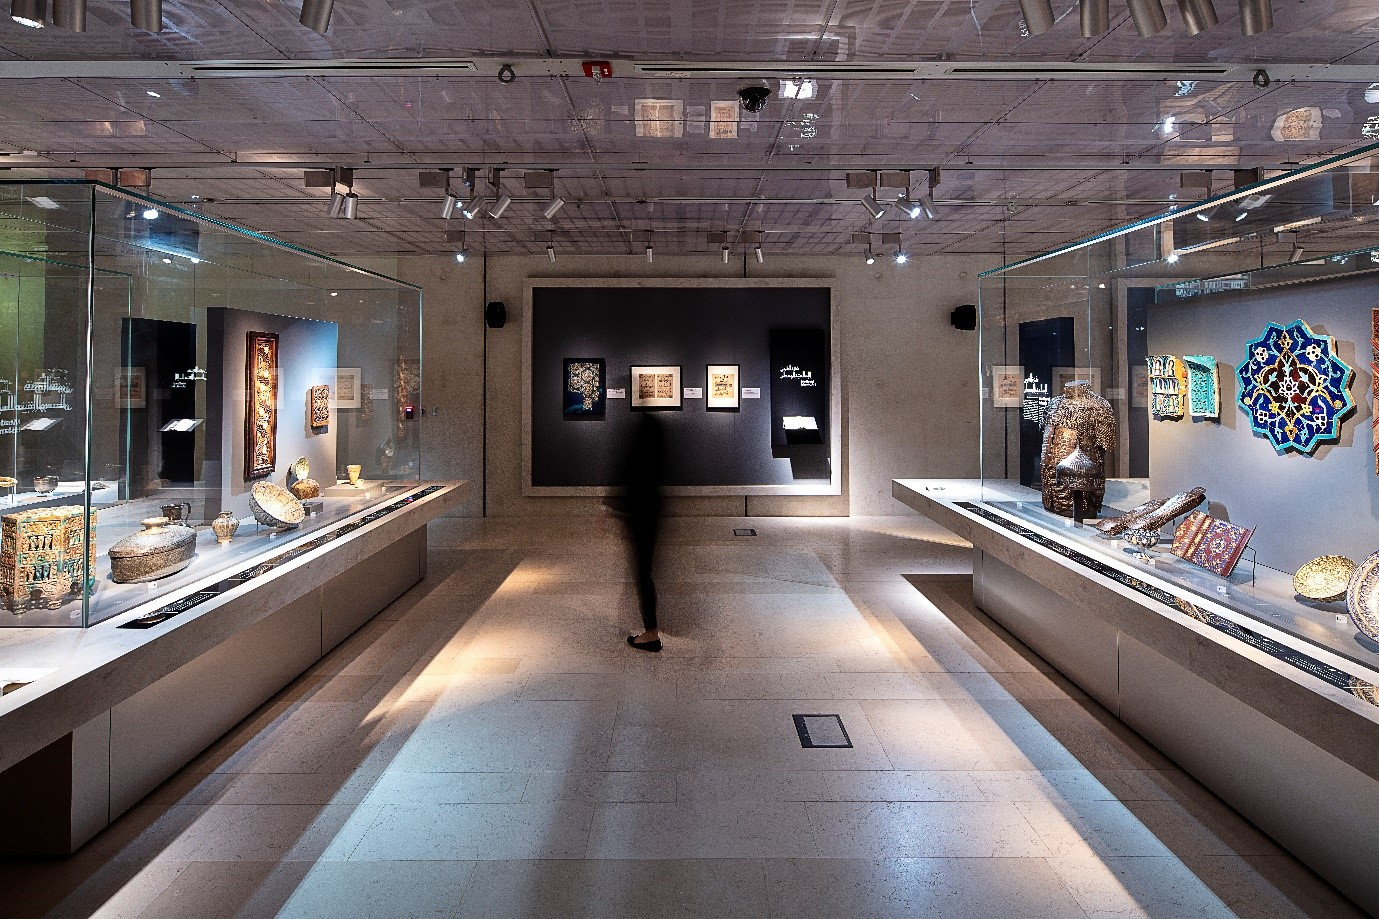 Exhibition of Islamic Art